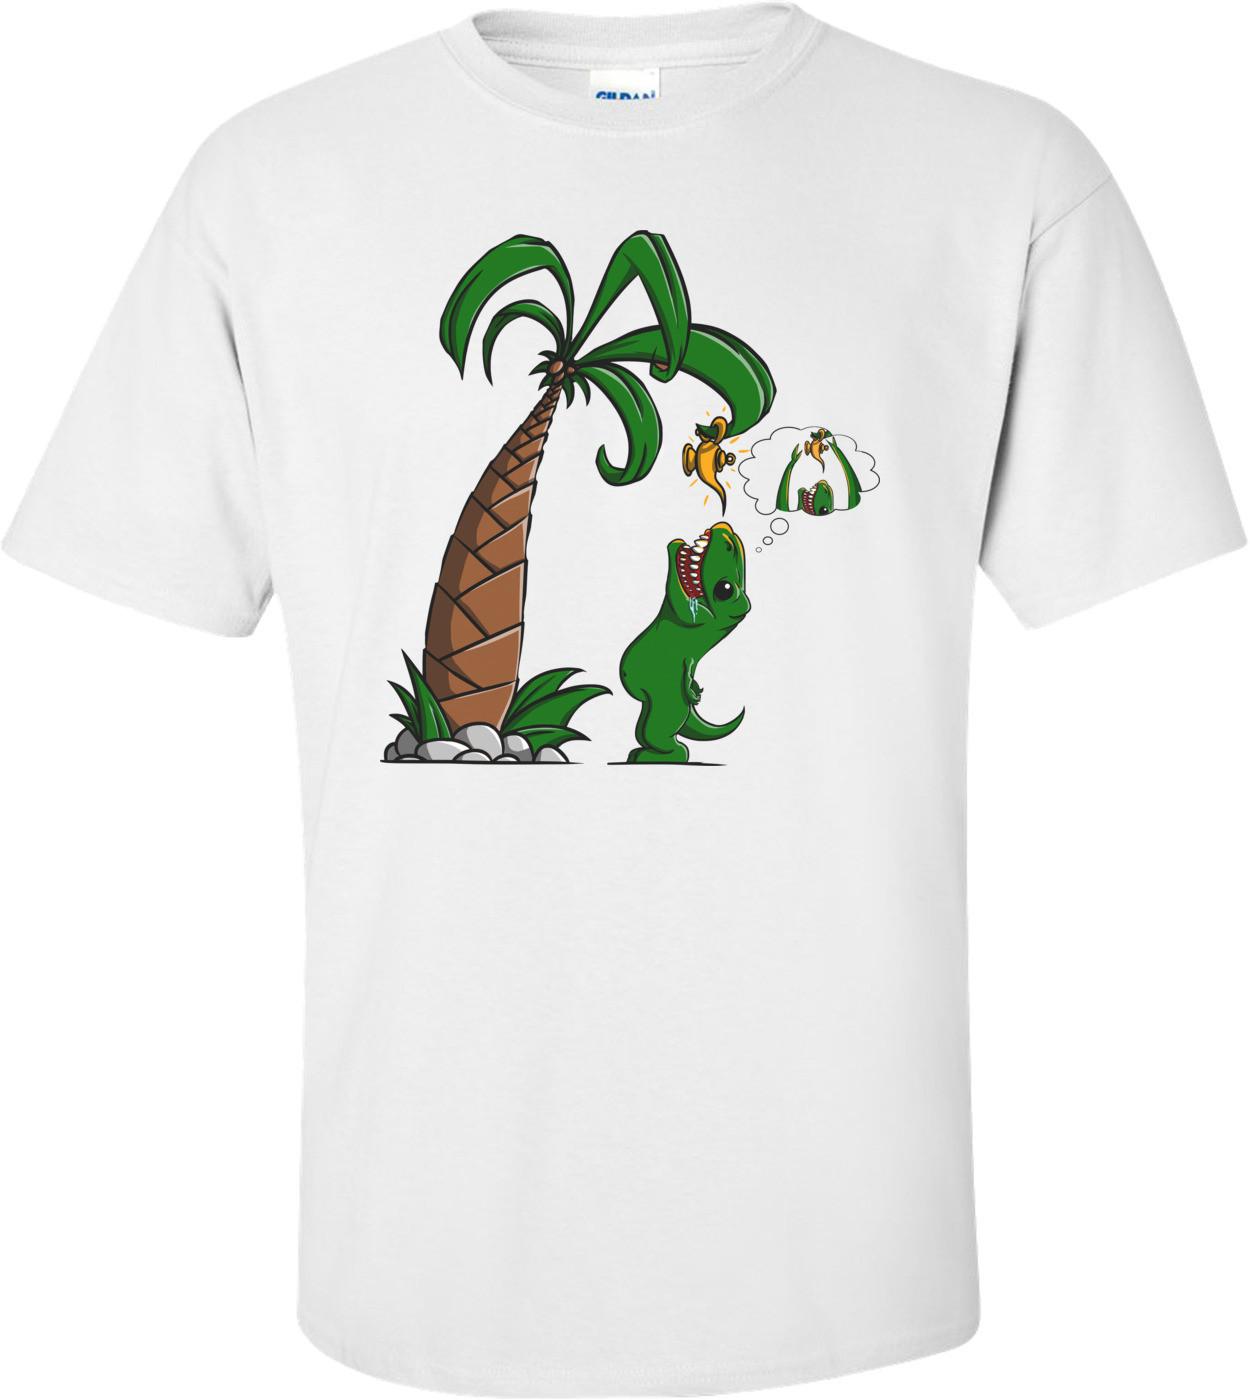 T-rex Wants To Make A Wish Shirt